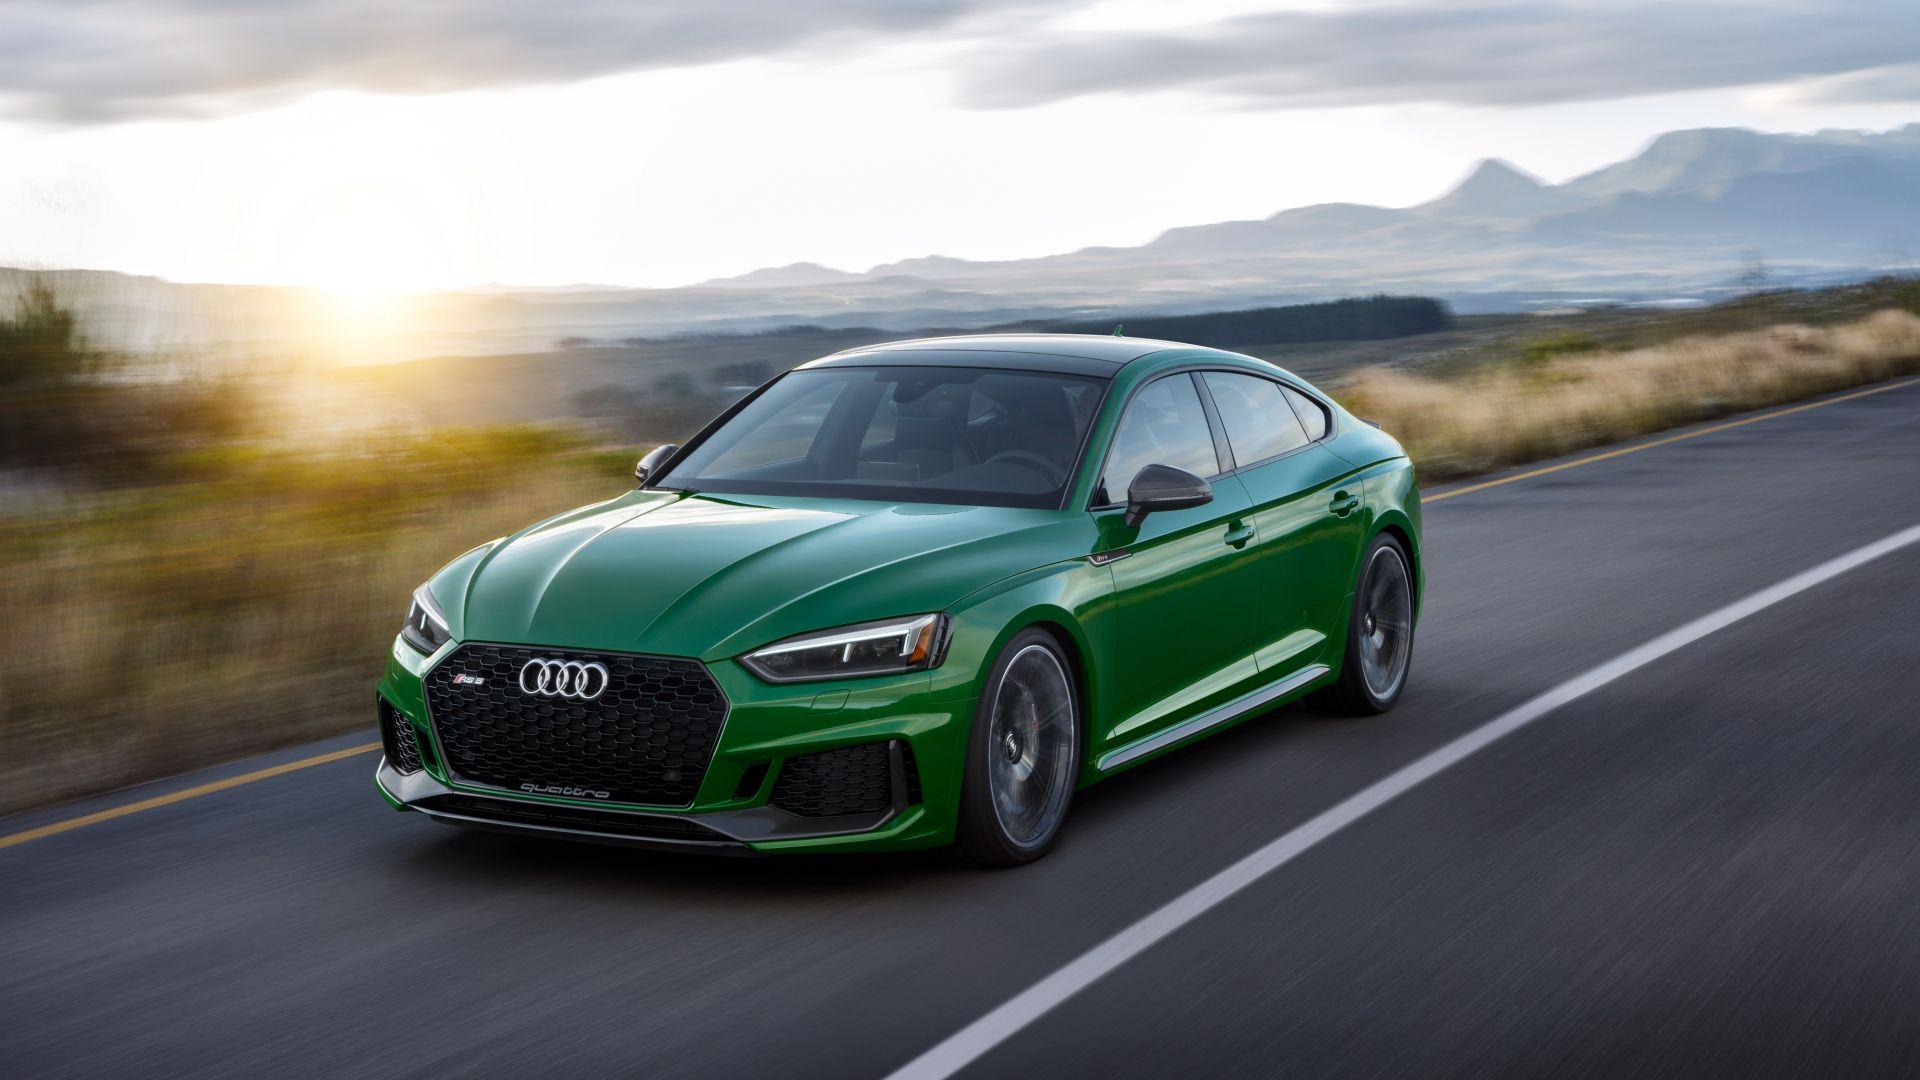 Audi Rs5 Sportback 4k 2019 Wallpapers: Wallpaper Audi RS5 Sportback, 2019 Cars, 4K, Cars & Bikes